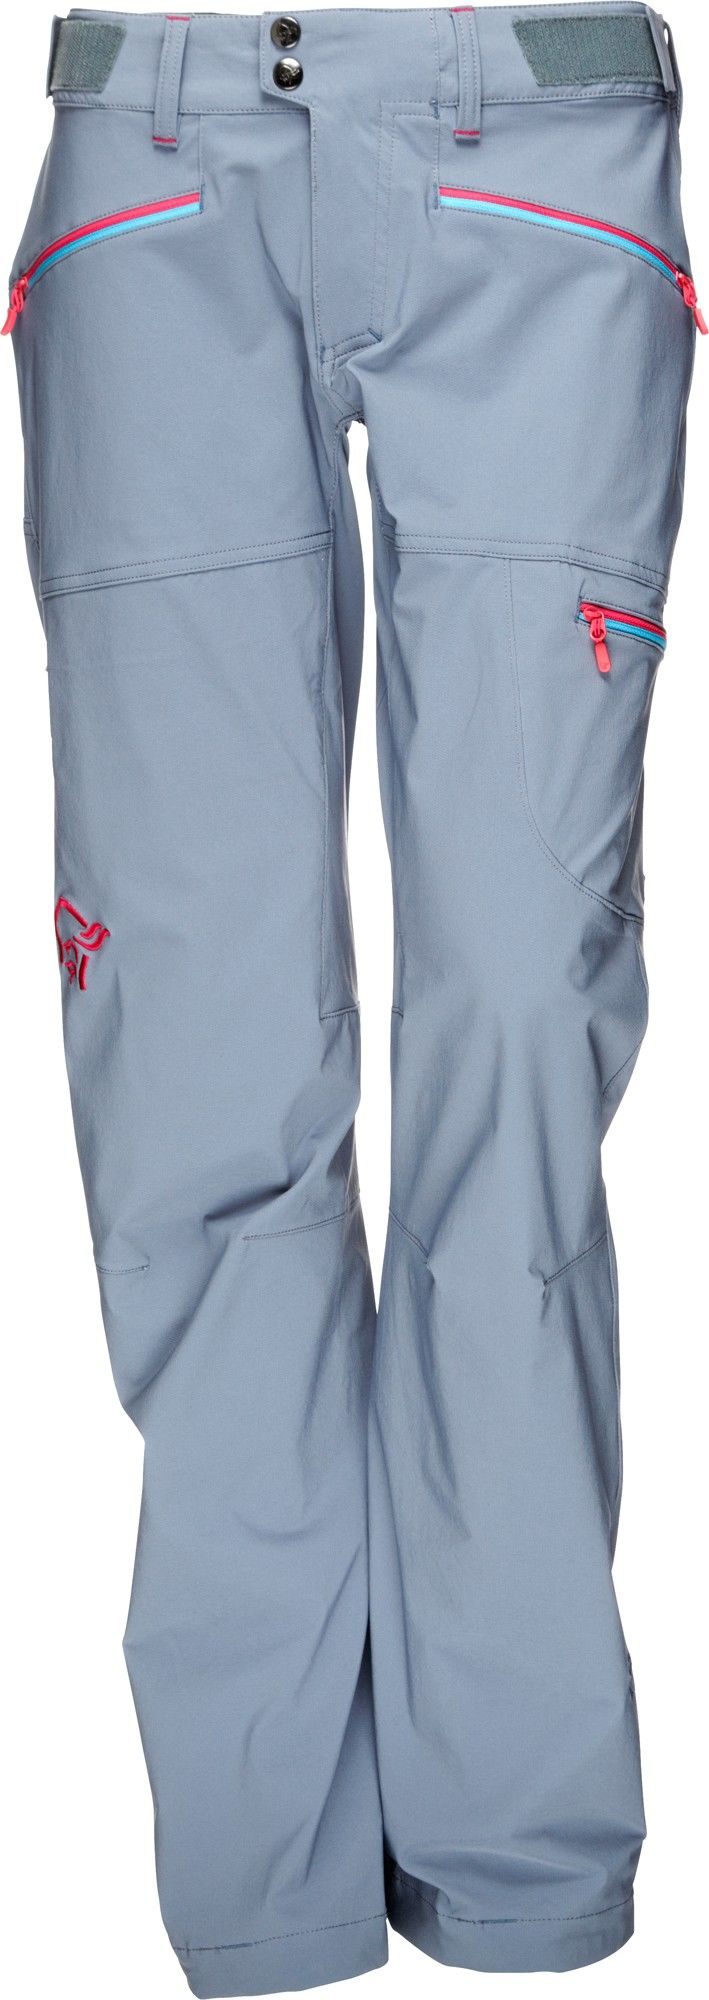 Norrona Falketind Flex1 Pants Grau, Female Hose, L